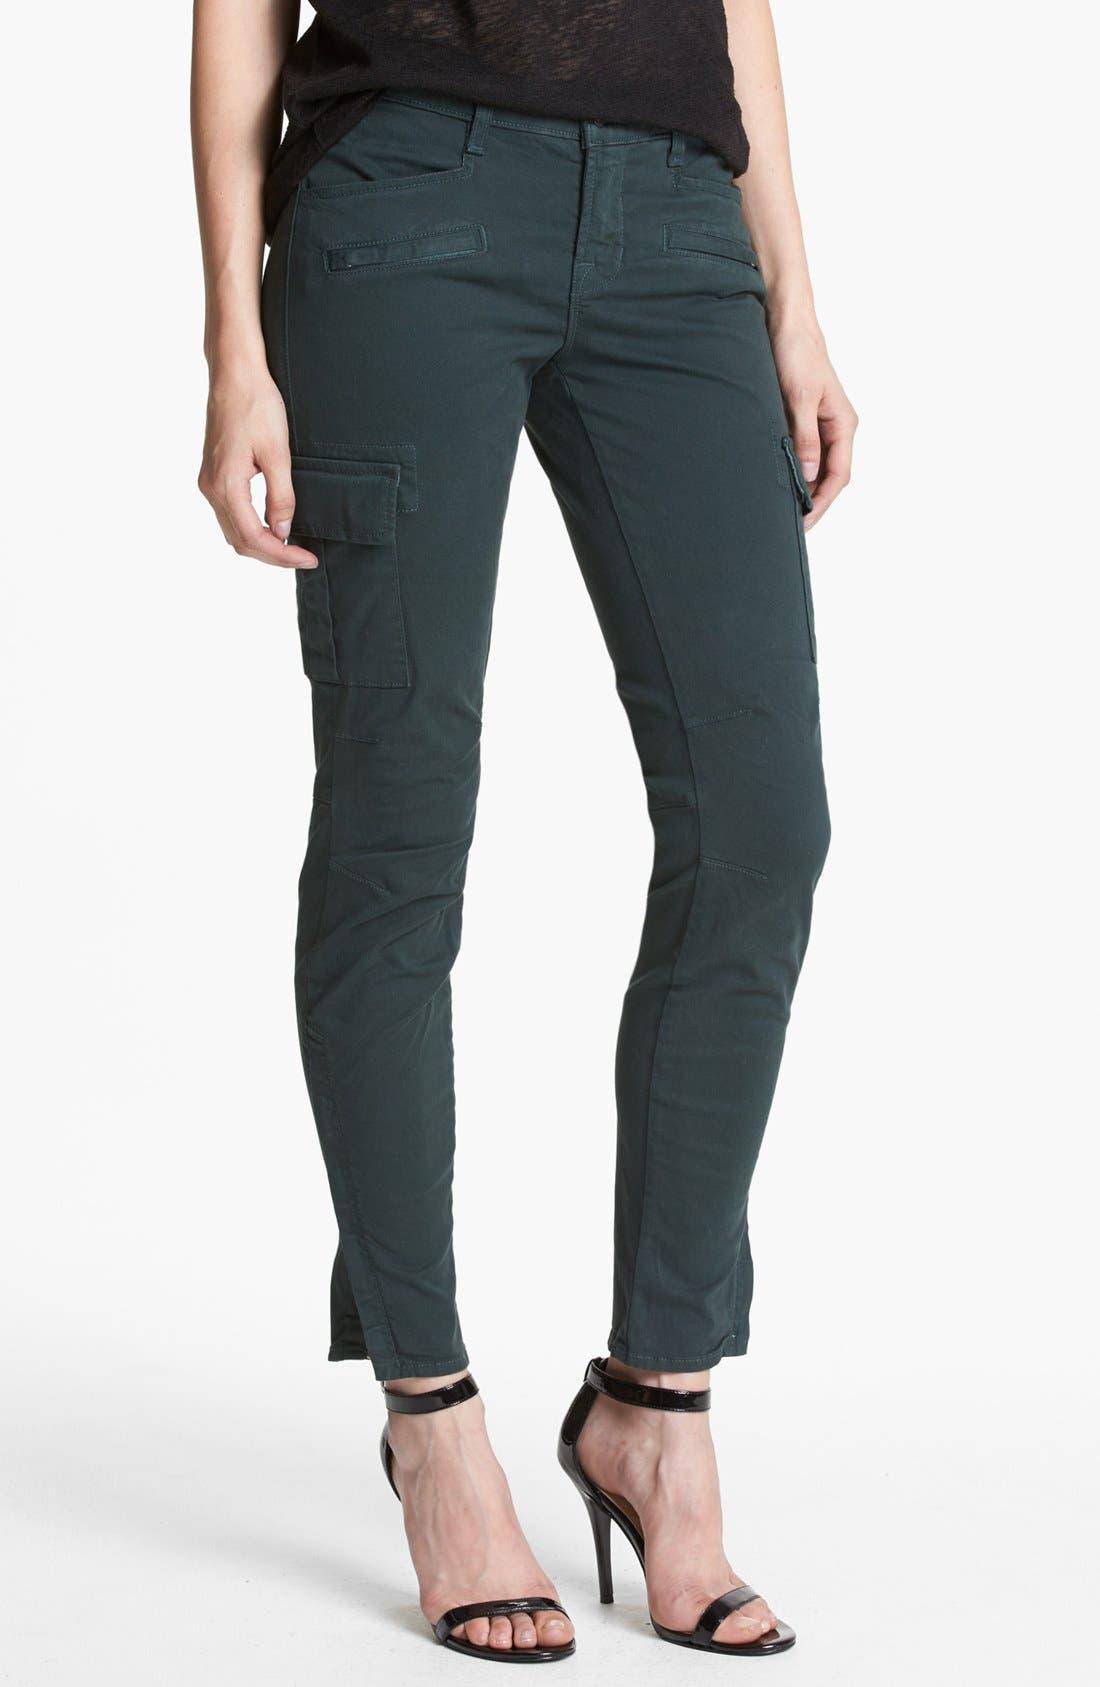 Alternate Image 1 Selected - J Brand '1550 Grayson' Skinny Cargo Pants